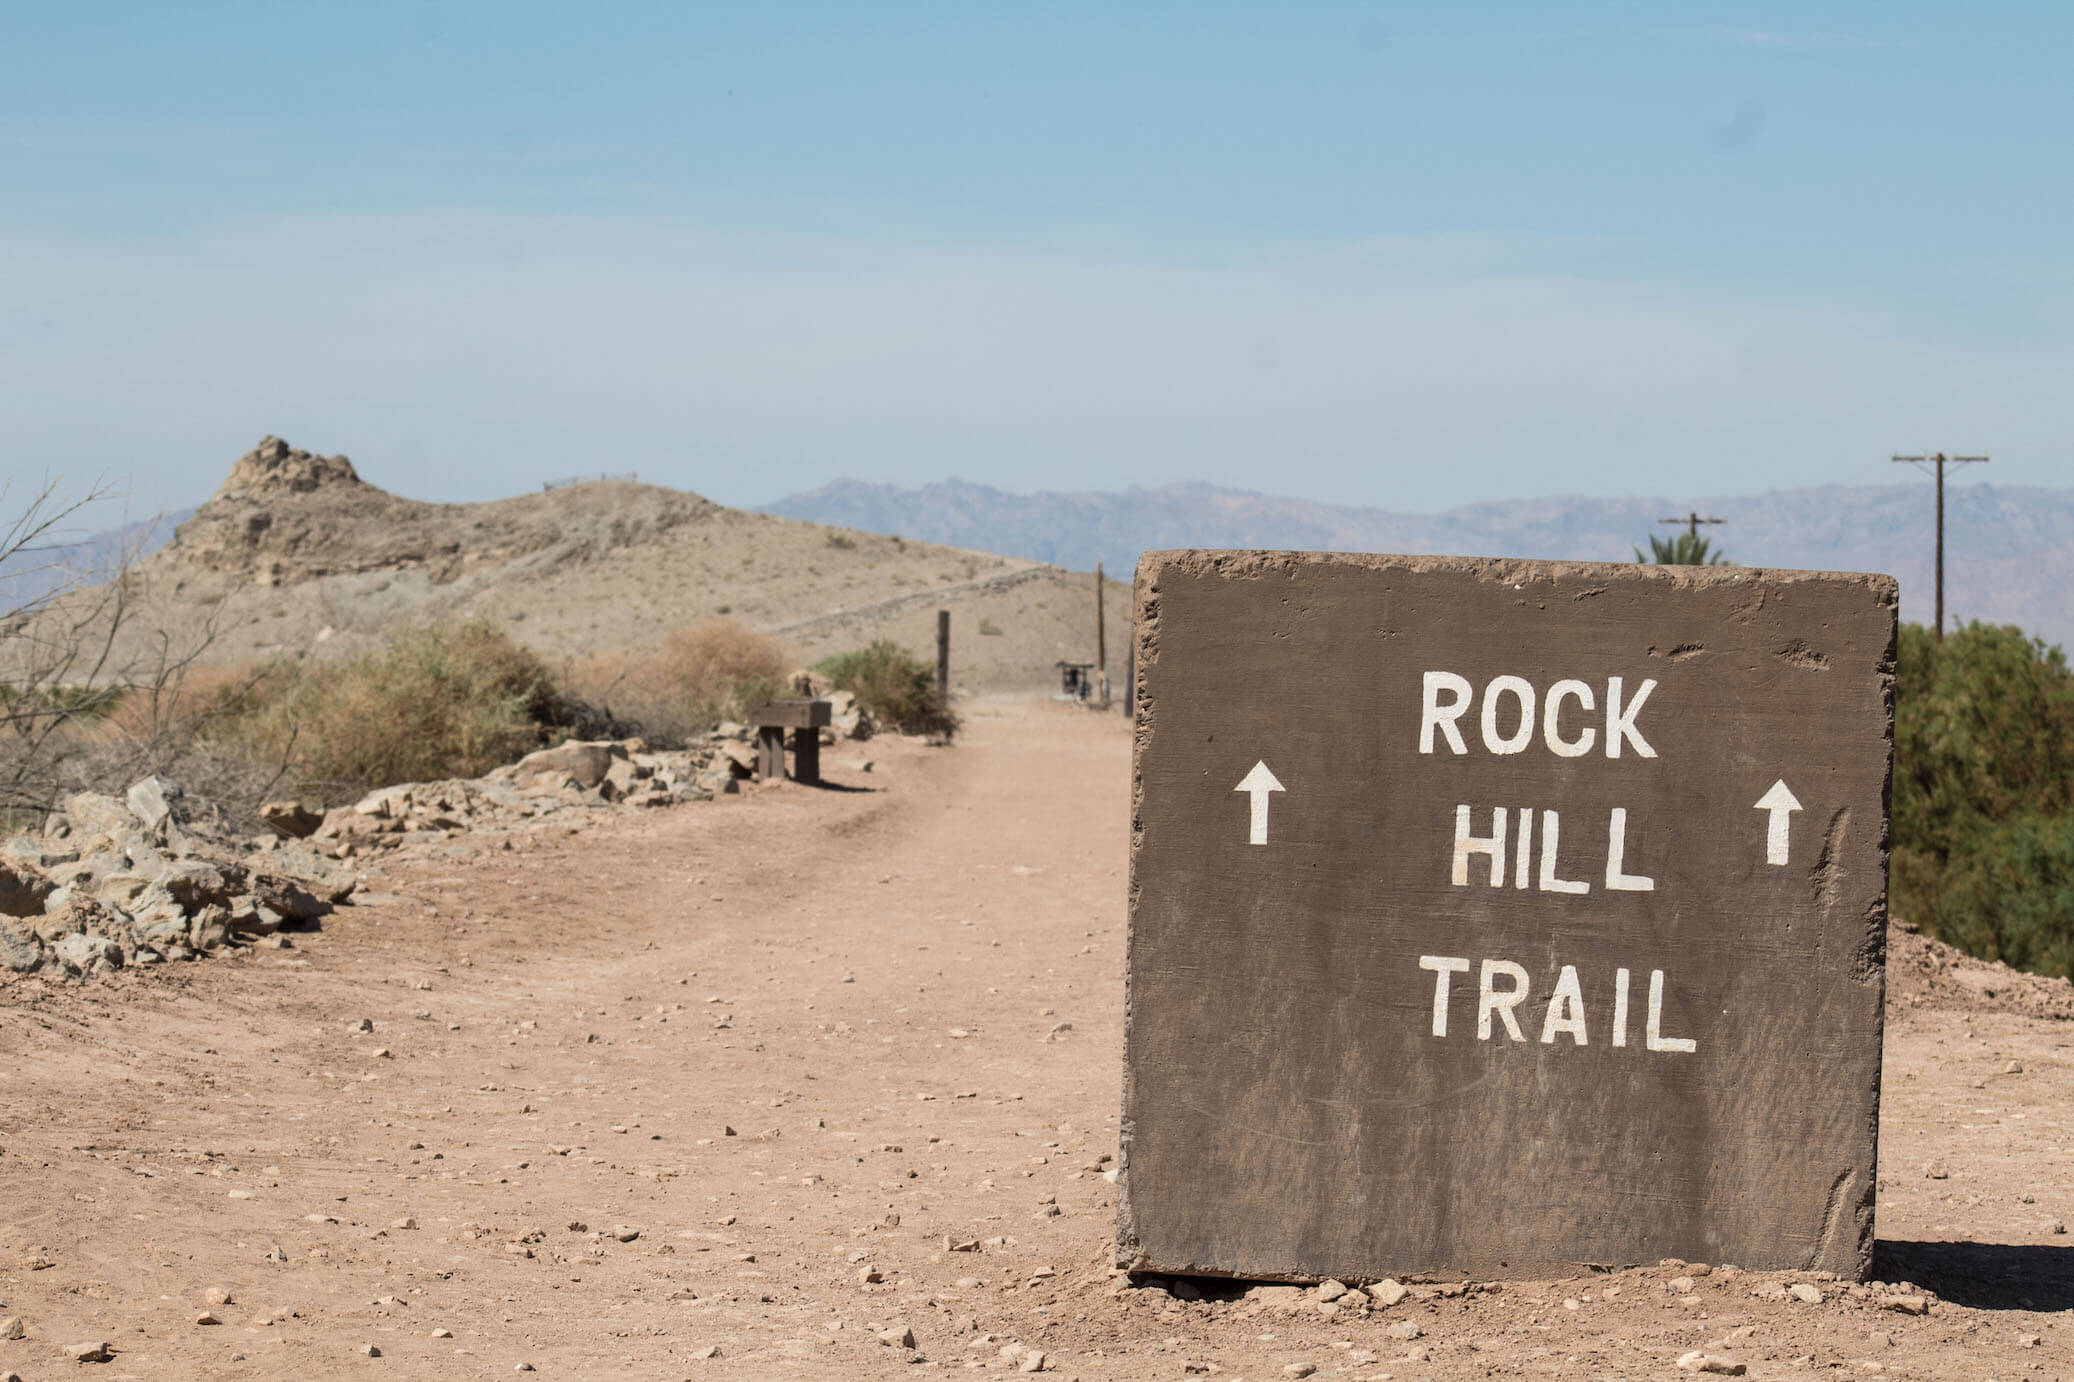 It's a climb but it's totally worth it!